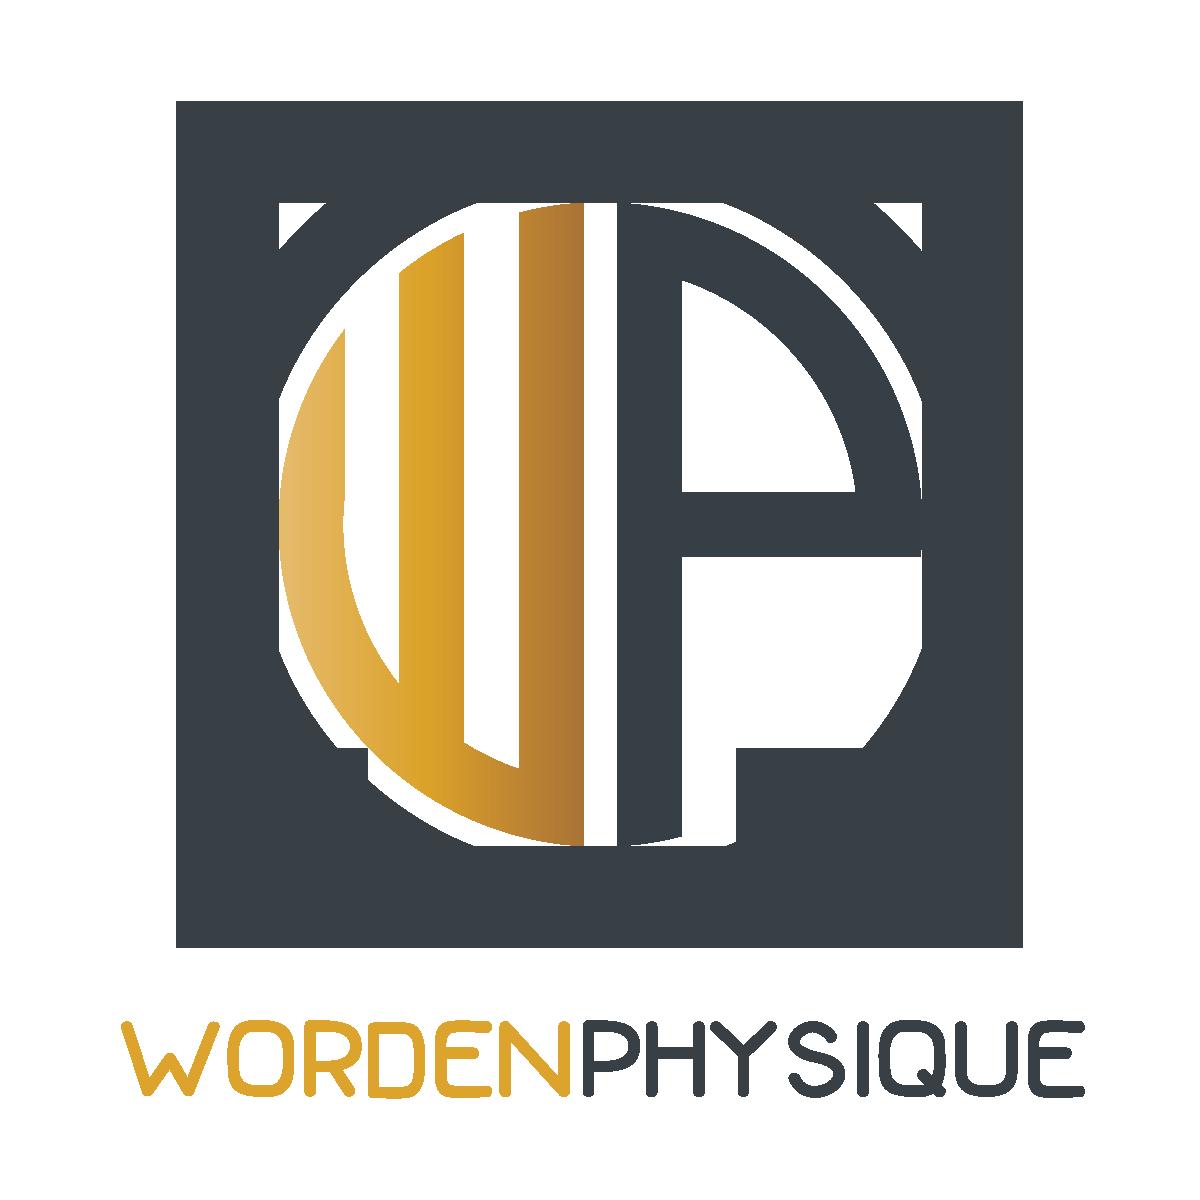 Worden Physique